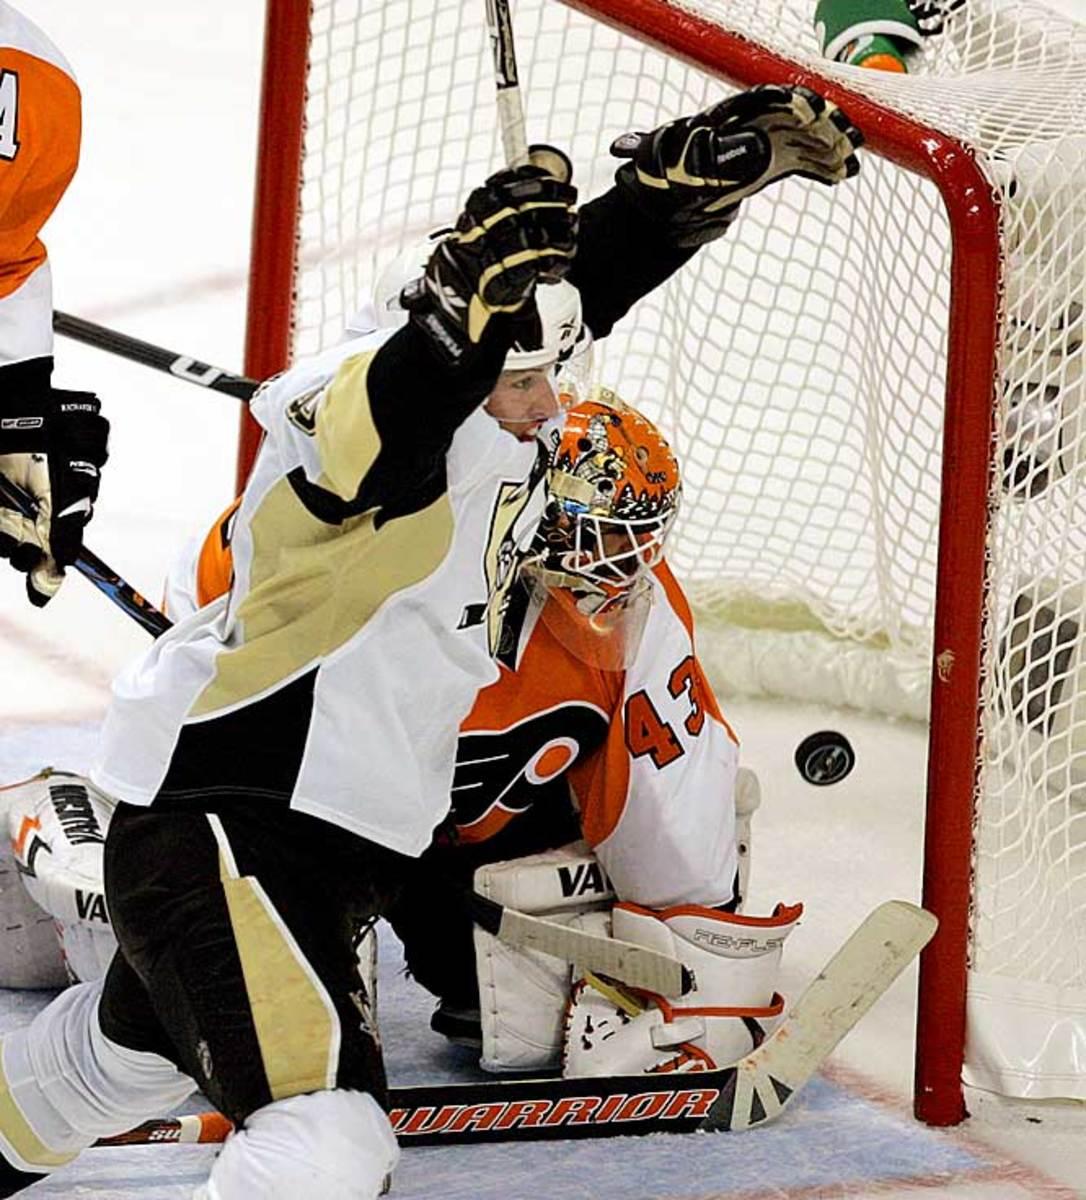 Sidney Crosby ties it up